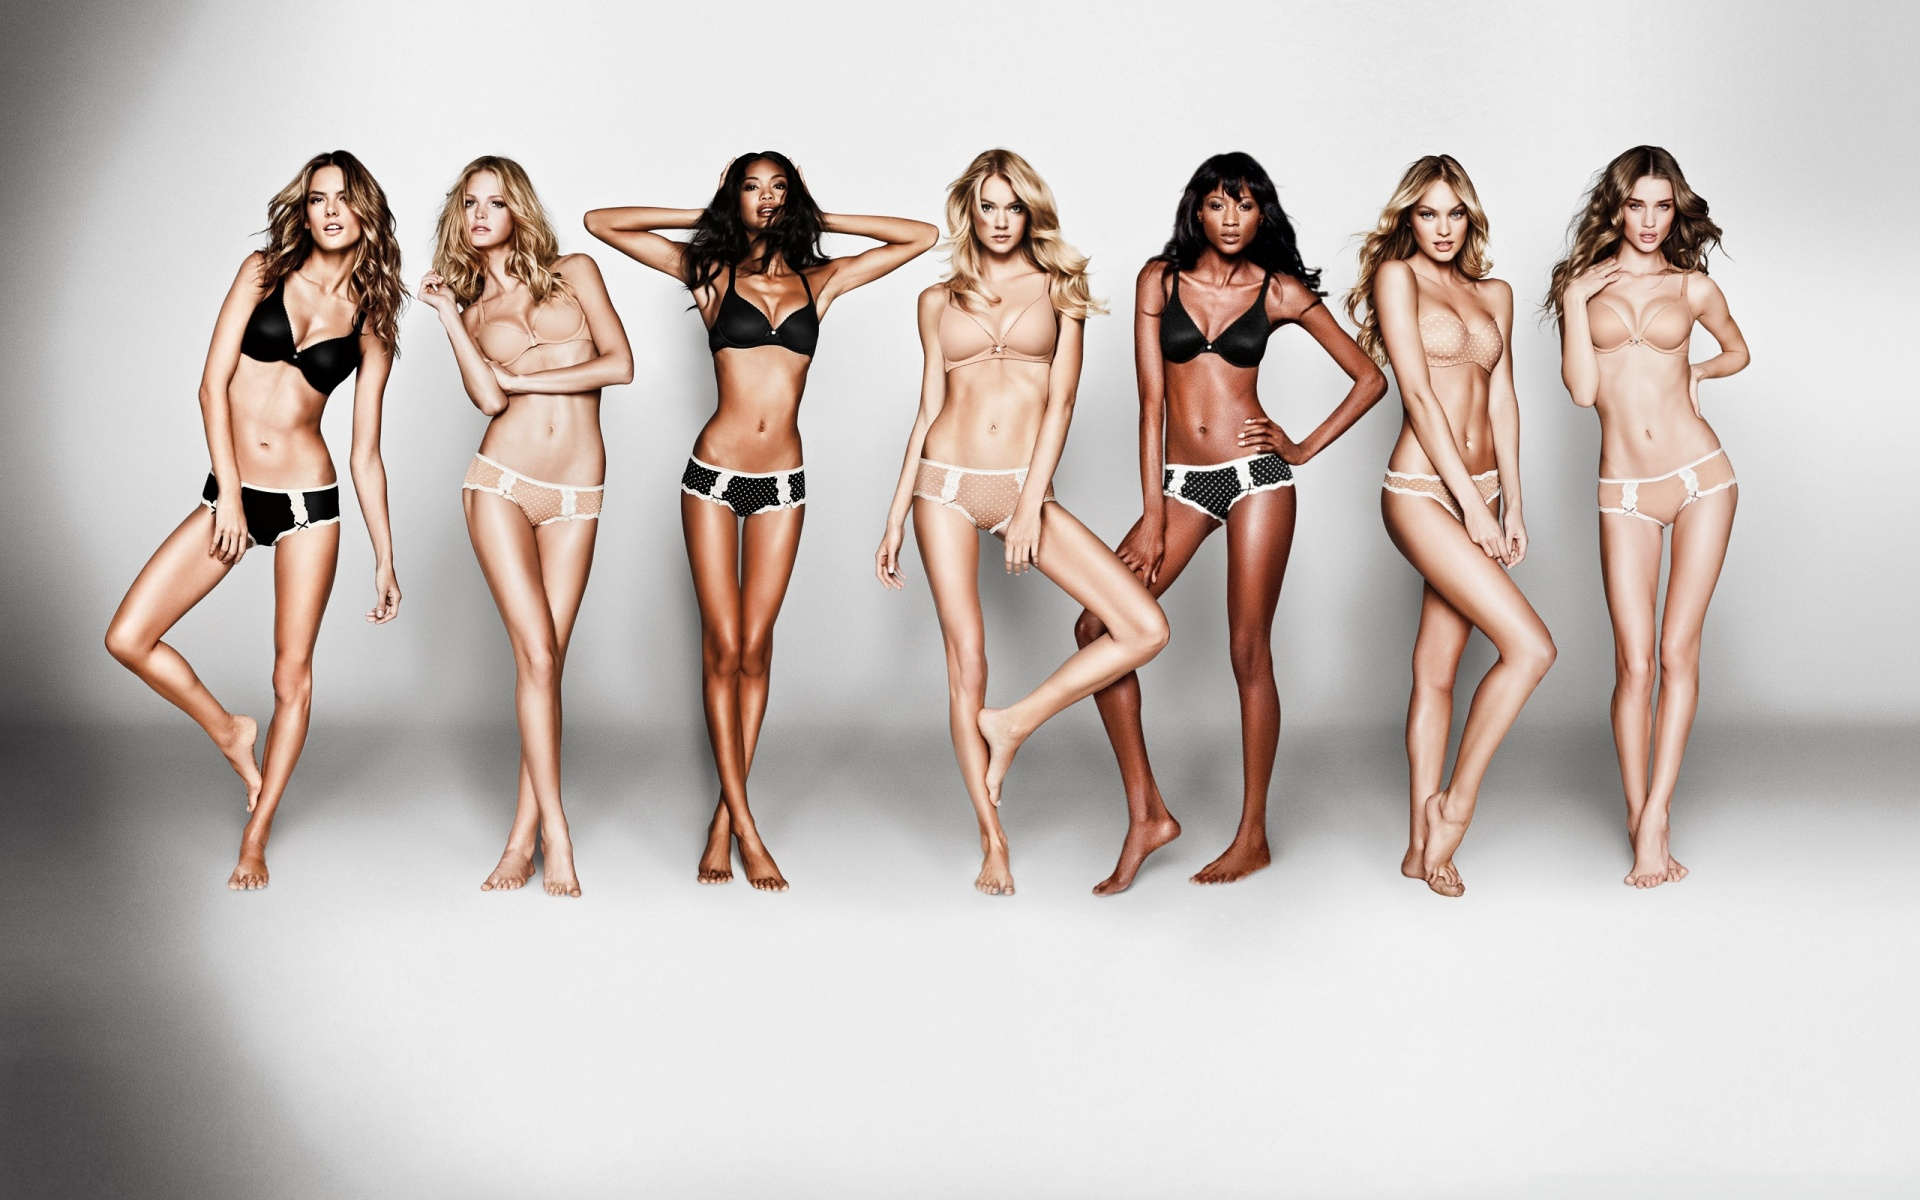 Victoria Secret Models Ultra HD Desktop Background Wallpaper for 1920x1200